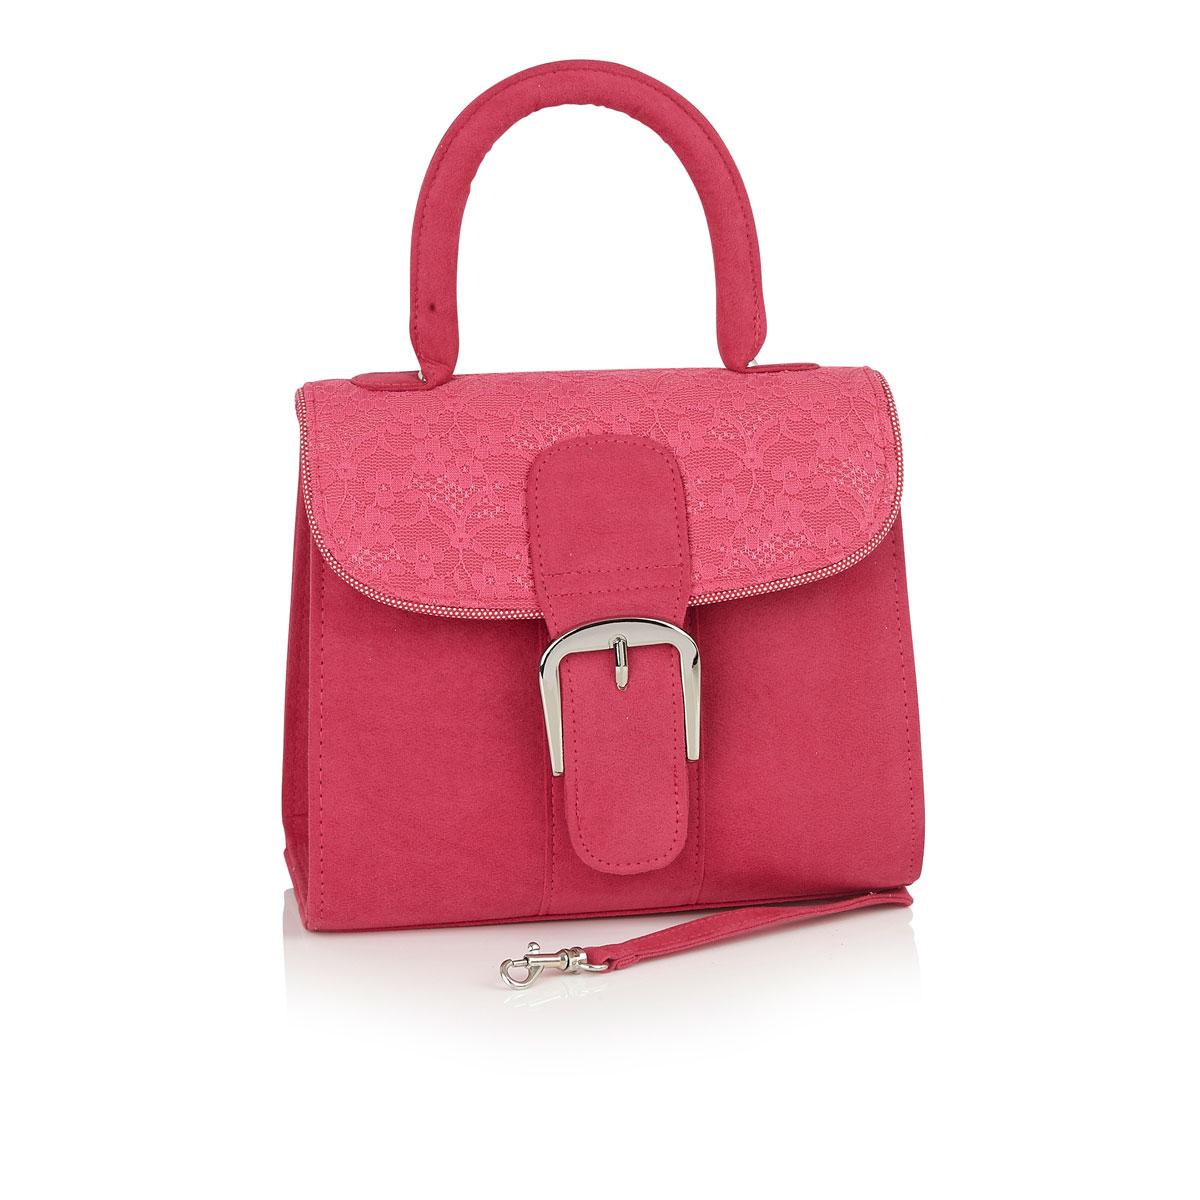 5ee7941e651d Ruby Shoo Matching Handbag - Fuchsia - 50183 62 RIVA VERONICA